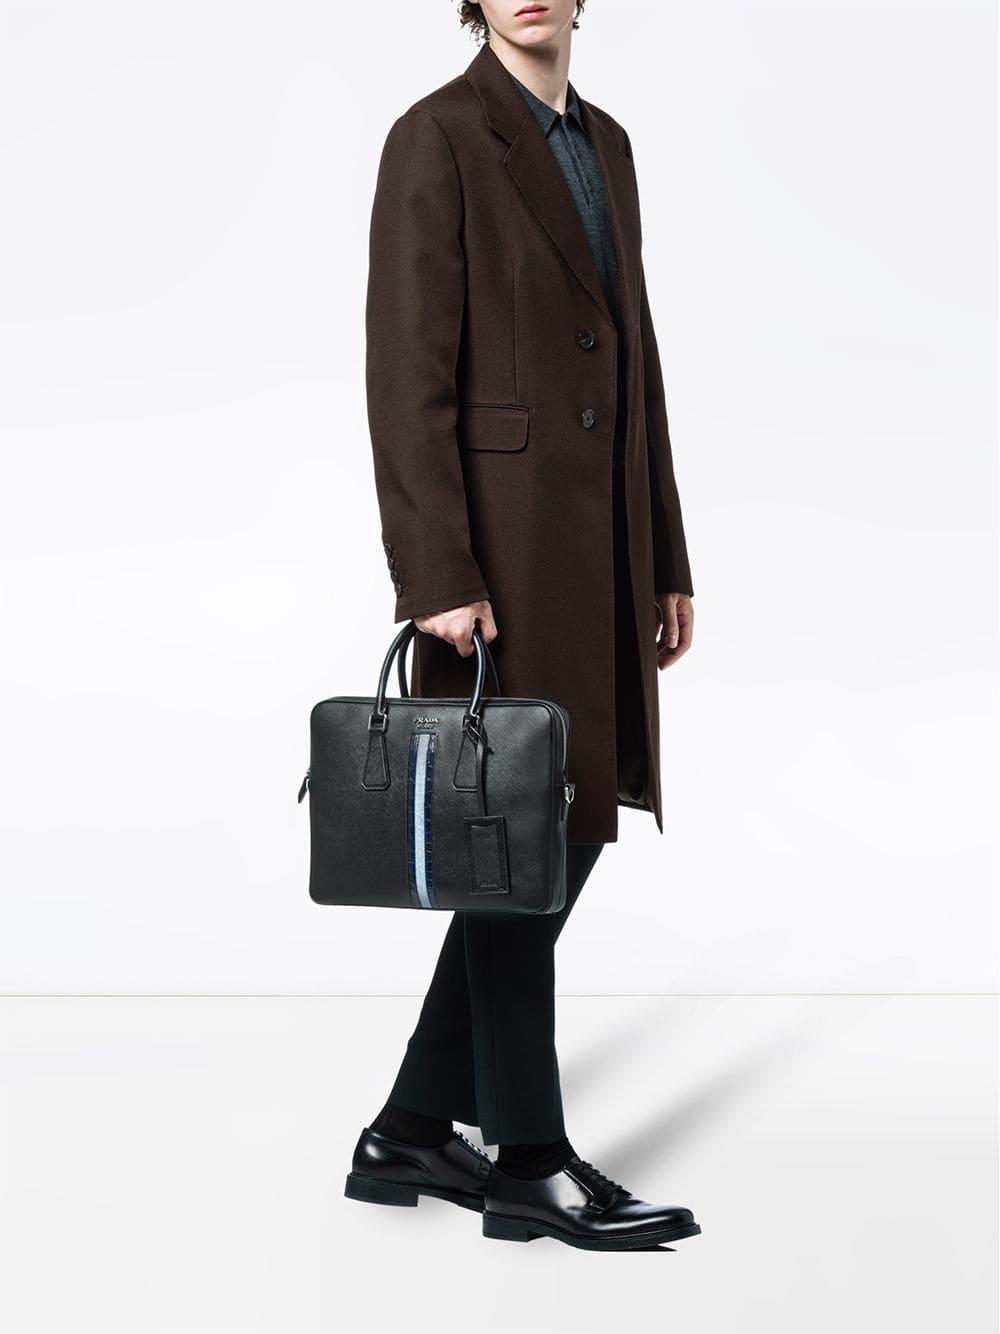 2d31f3c378c8d Prada Saffiano Leather Work Bag in Black for Men - Lyst